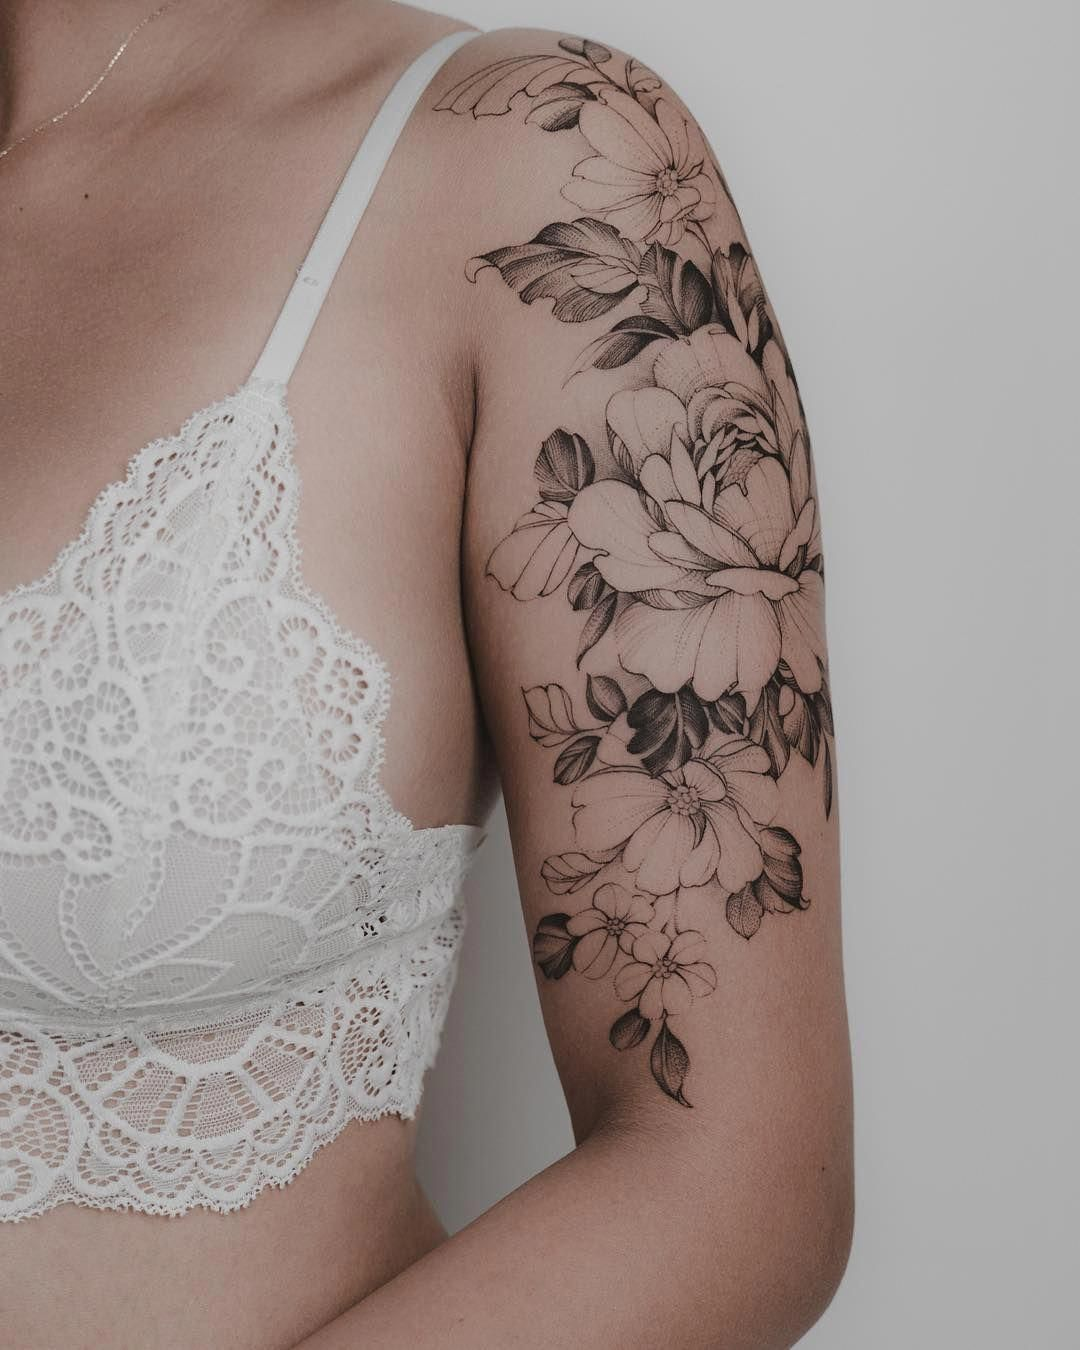 Pretty Sleeve Tattoo Sleevetattoos In 2020 Feminine Tattoo Sleeves Half Sleeve Tattoo Upper Arm Sleeve Tattoos For Women